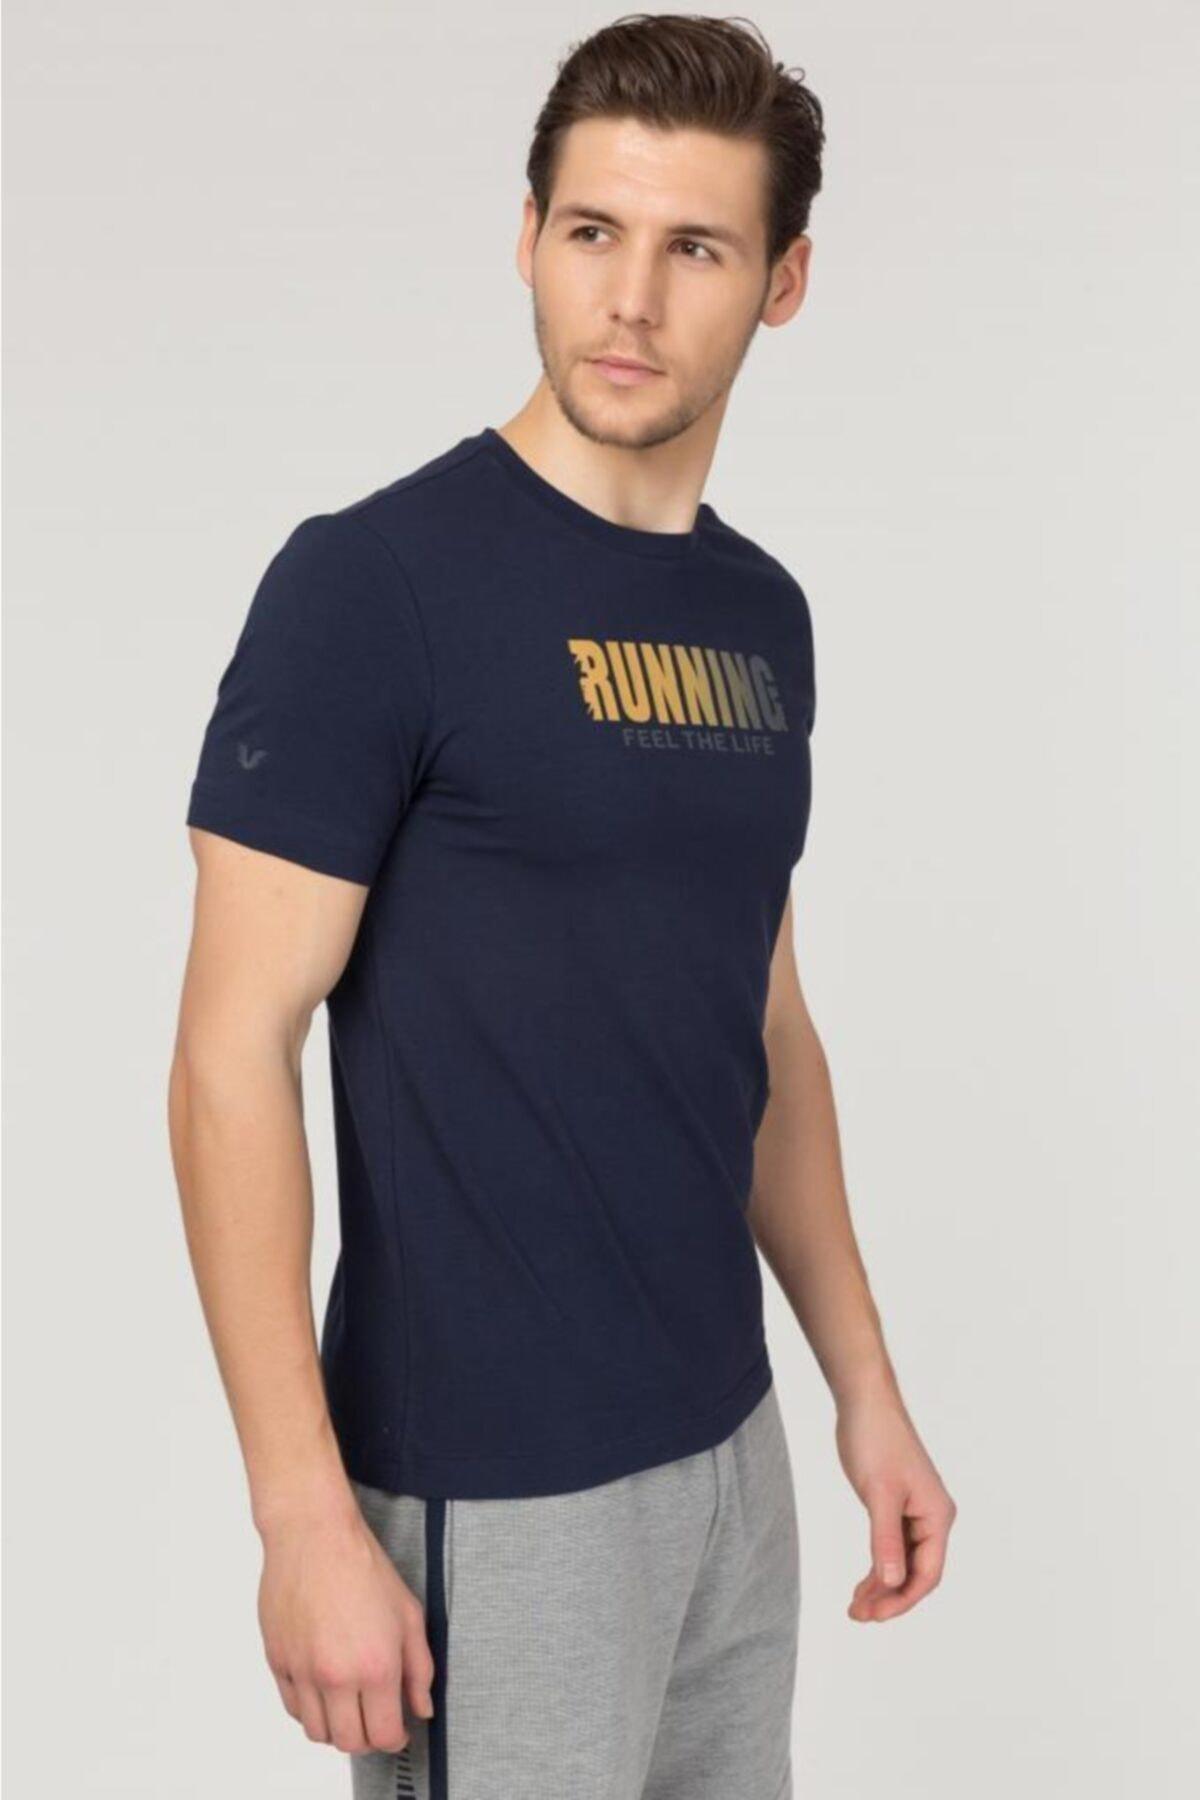 bilcee 1681 Erkek Örme Tshirt Tb19mf07s1681-1 2